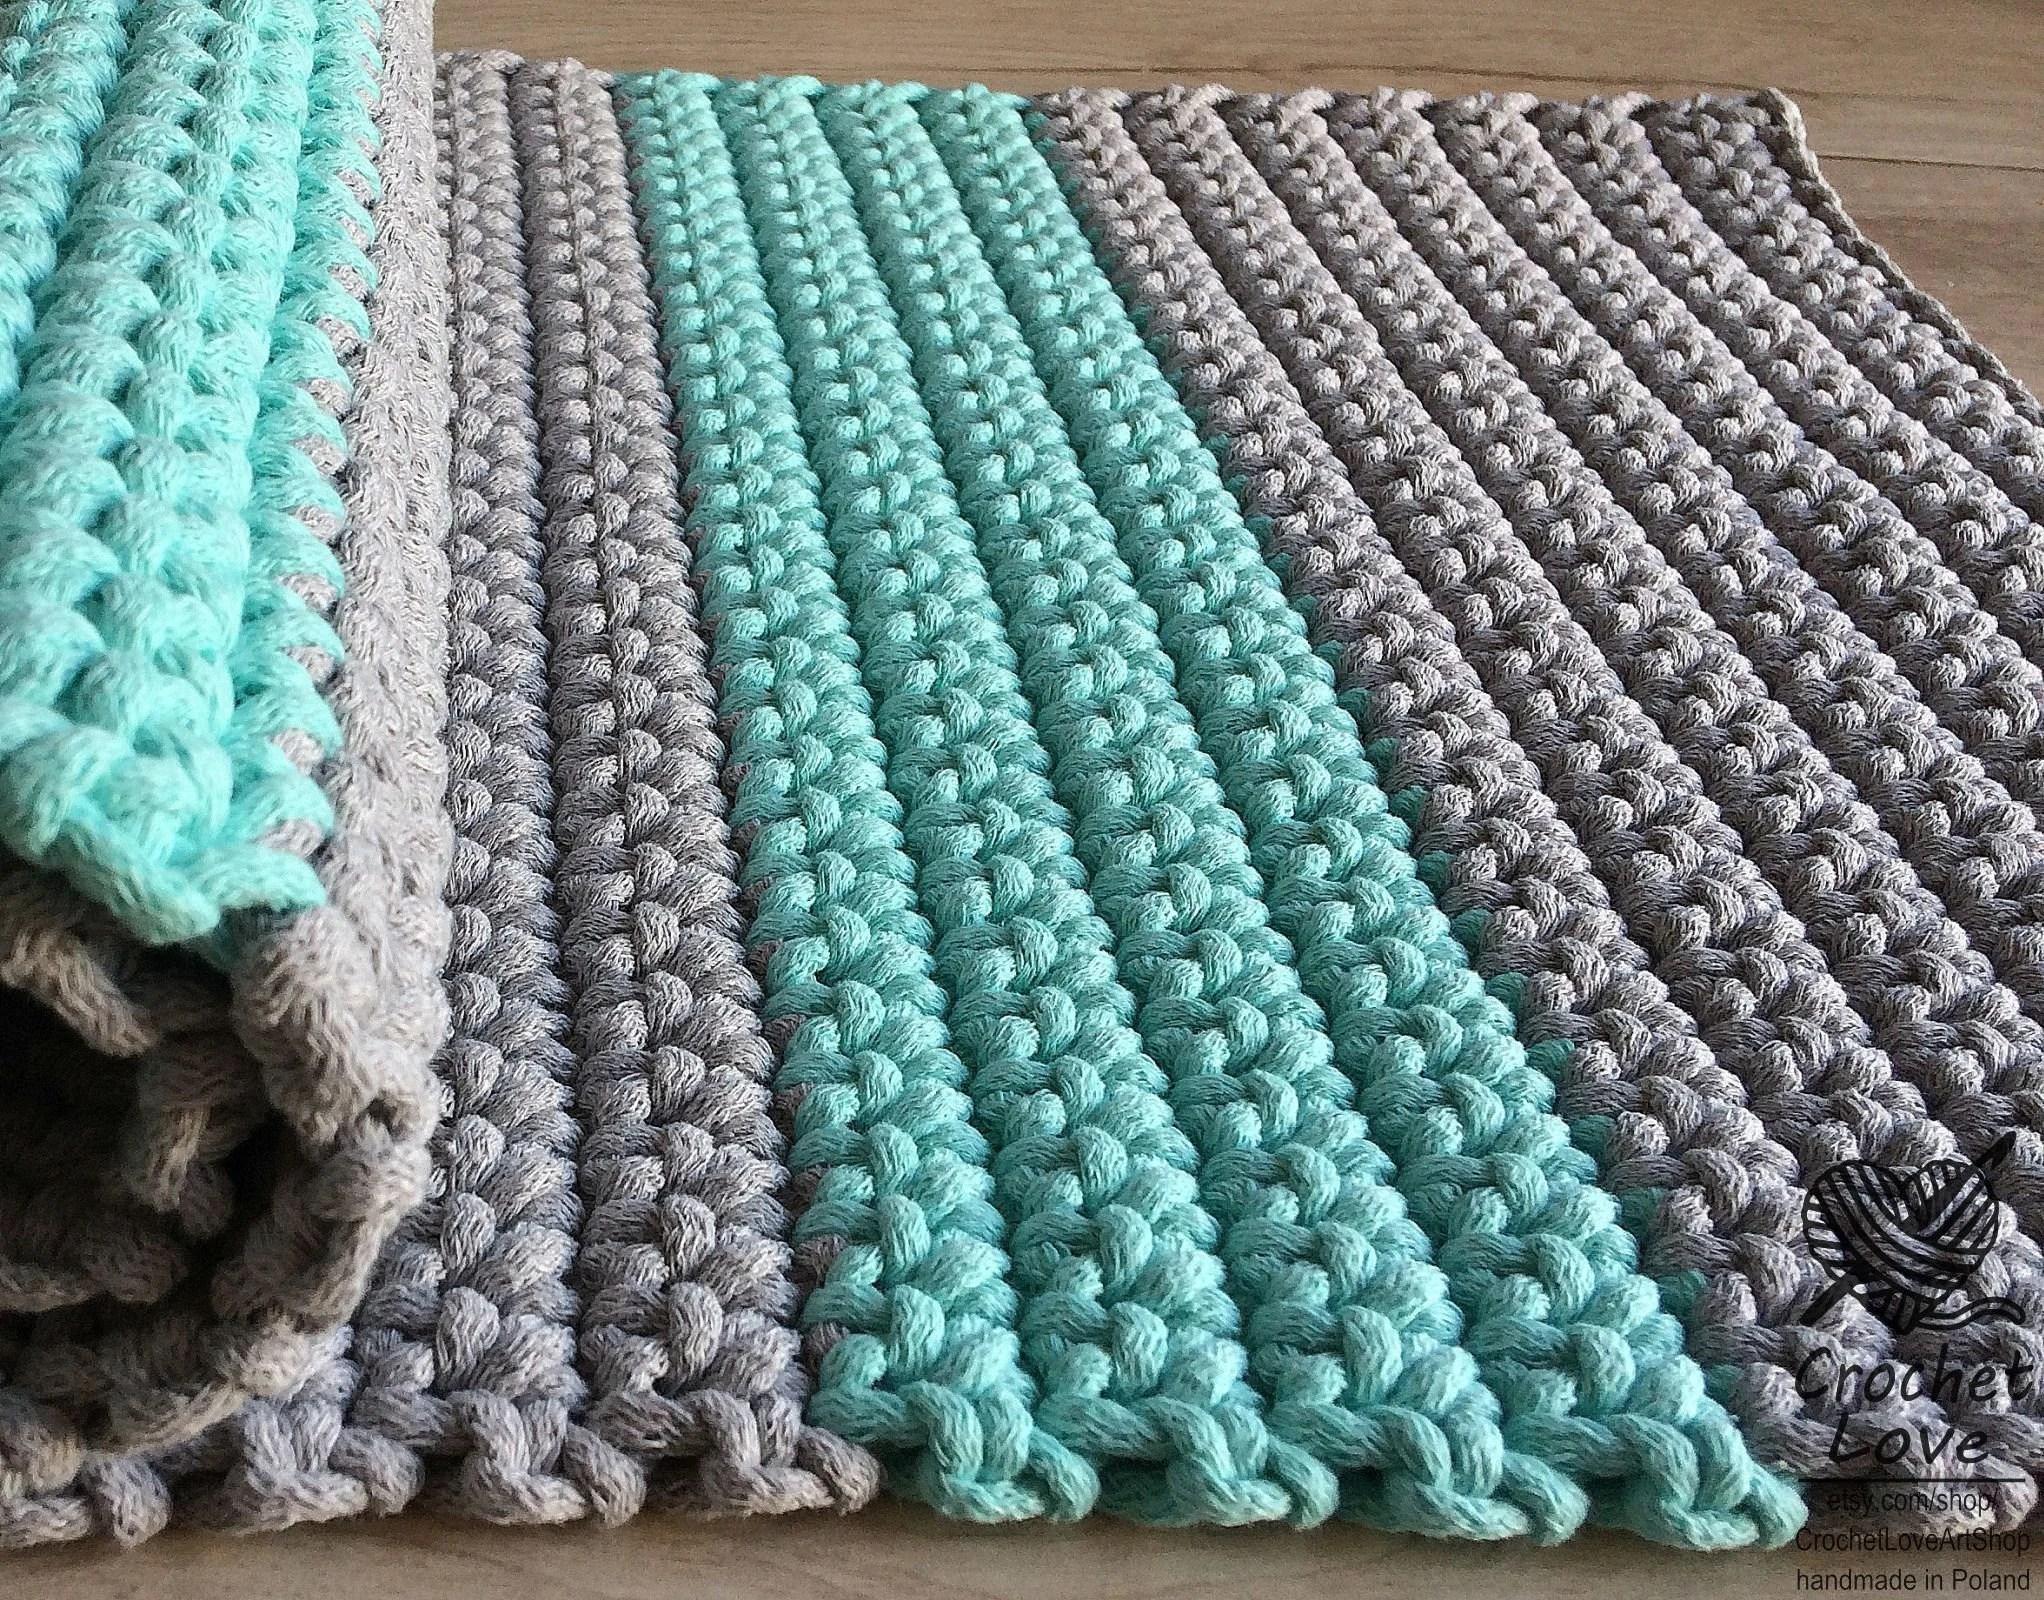 rectangulaire crochet rug tapis rectangulaire tapis au crochet tapis tricote tapis tricote a la main tapis rectangulaire gris et menthe ou choix